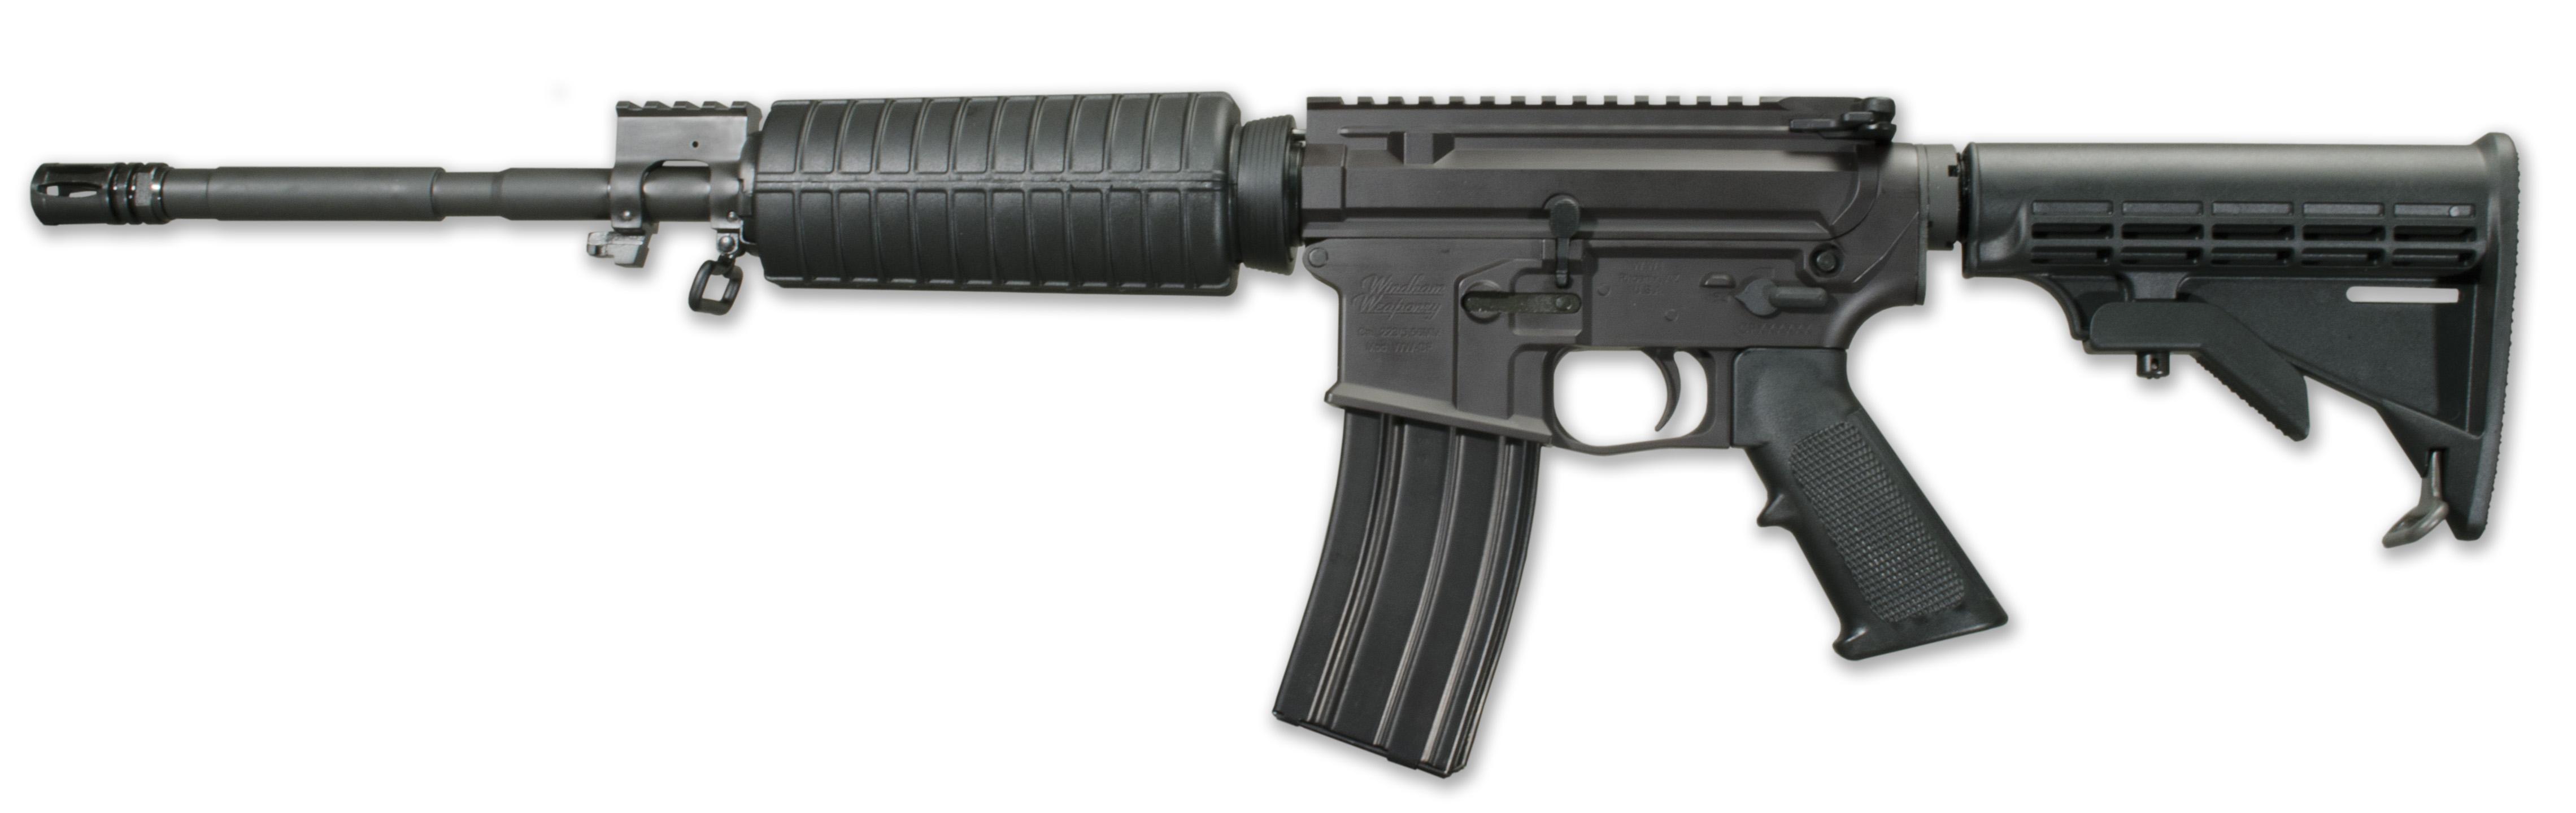 carbon fiber src windham weaponry online ar 15 manufacturer